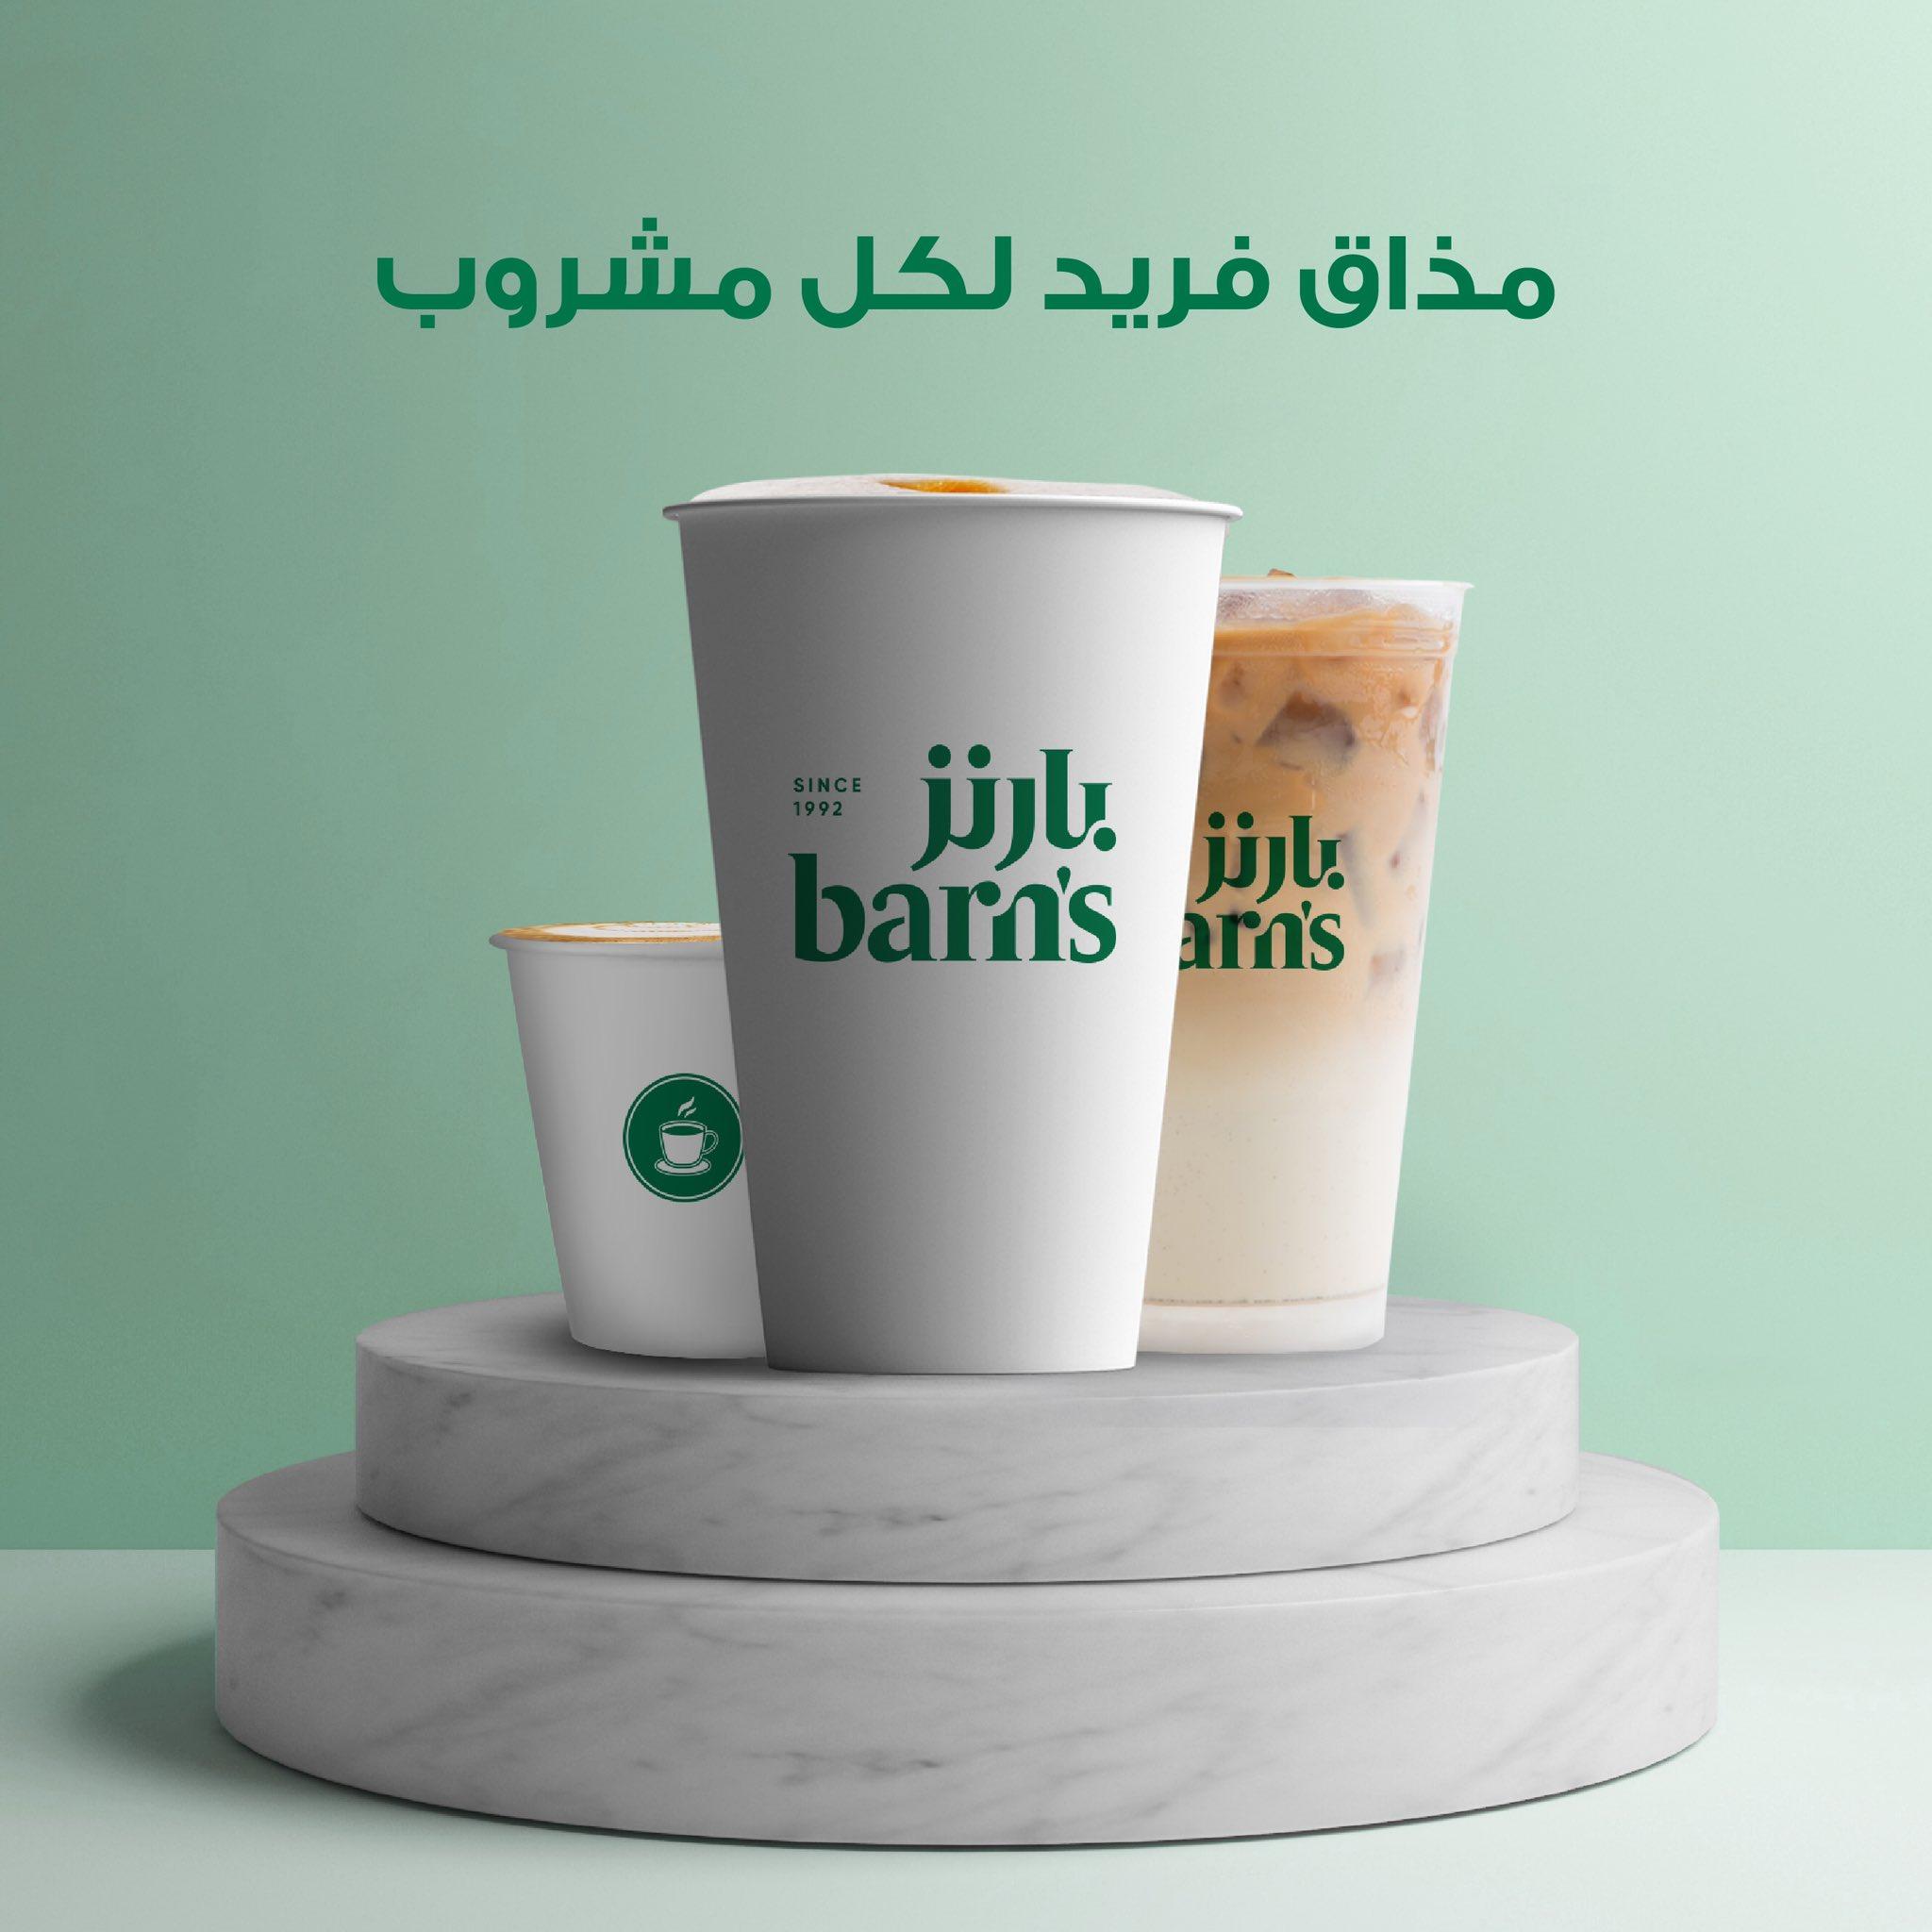 Barn S بارنز On Twitter كل واحد يحب نوع قهوته على ذوقه اللي يحبها ساده واللي يشربها باردة وبنكهة معينة شاركنا ايش قهوتك والمفضلة وايش المميز فيها قهوة بارنز Https T Co Pgi7ajjucr